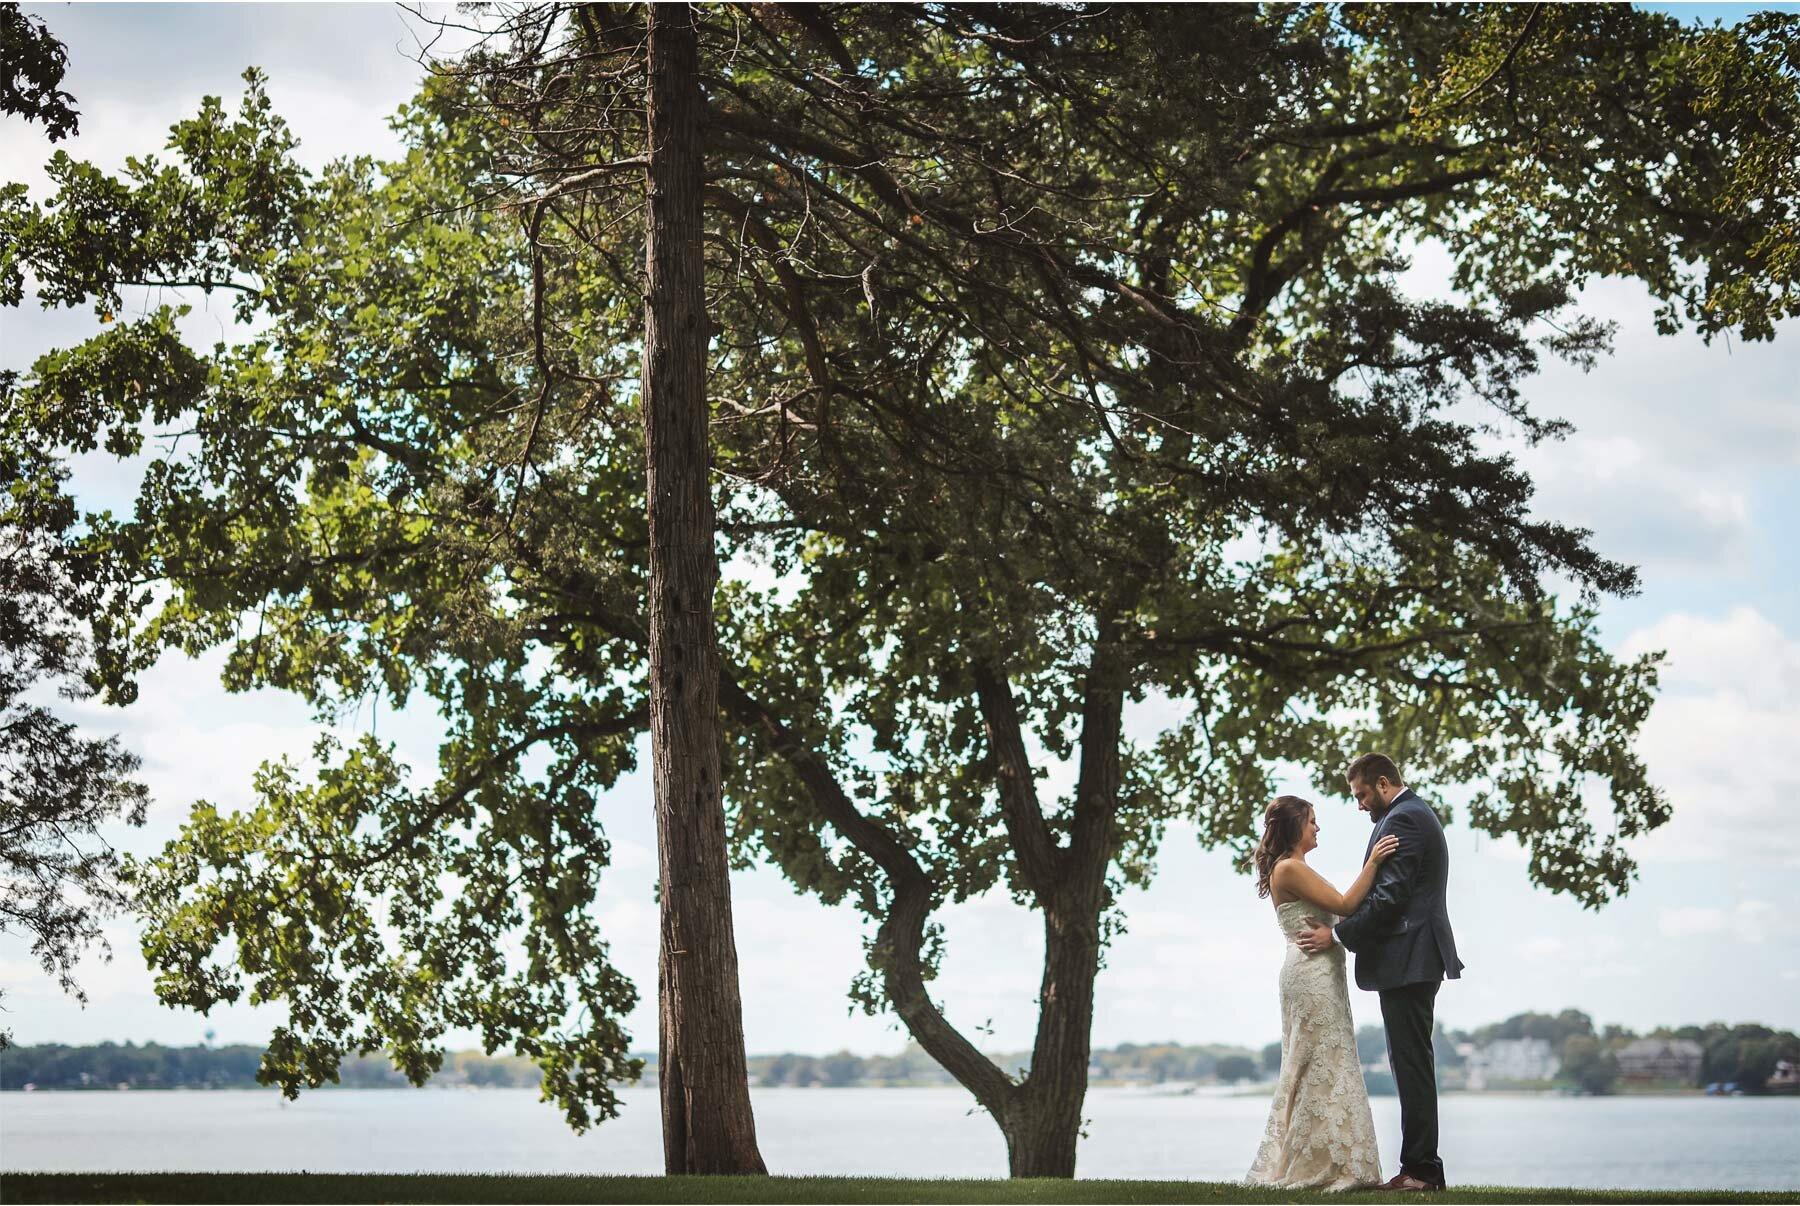 07-Vick-Photography-Wedding-Minnetonka-Minnesota-Family-Home-Bride-Groom-First-Look-Lake-Katie-and-David.jpg